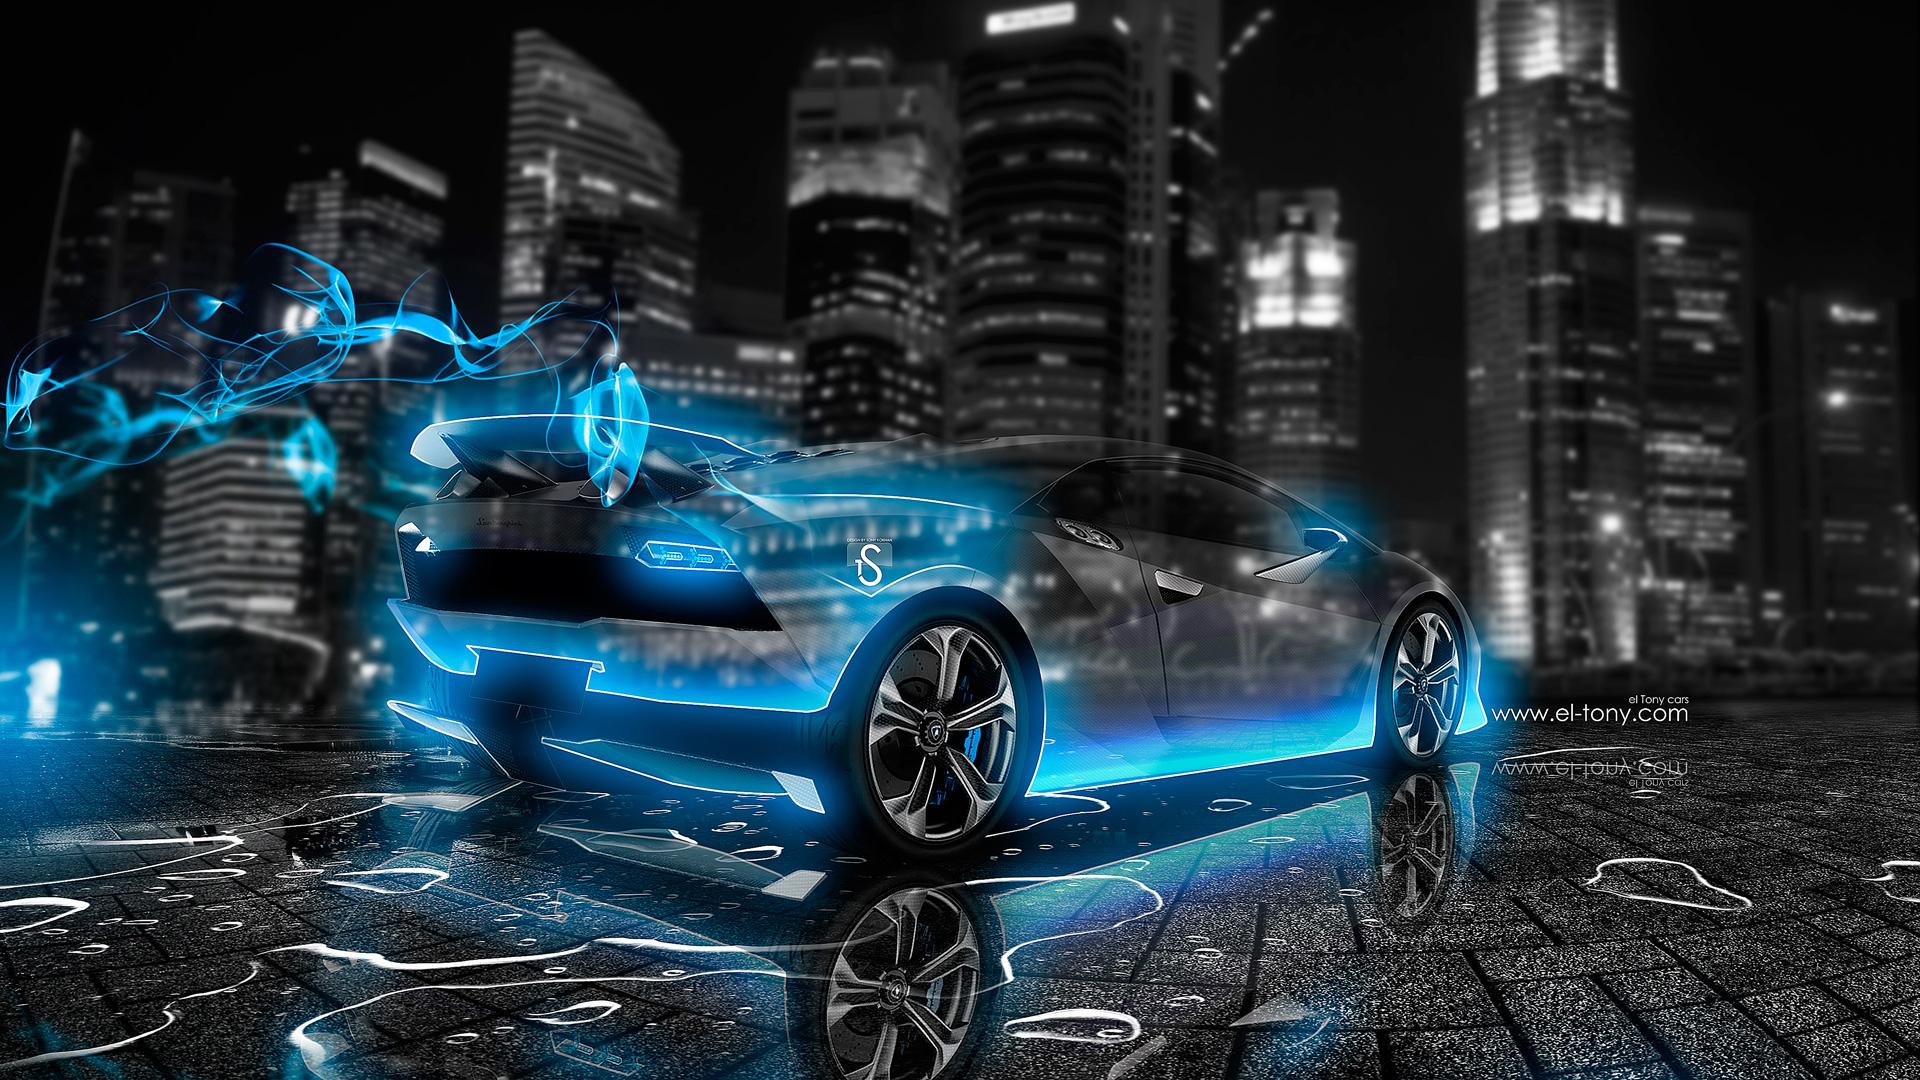 Lamborghini Sesto Elemento Crystal Blue Energy Car 2014 Design By